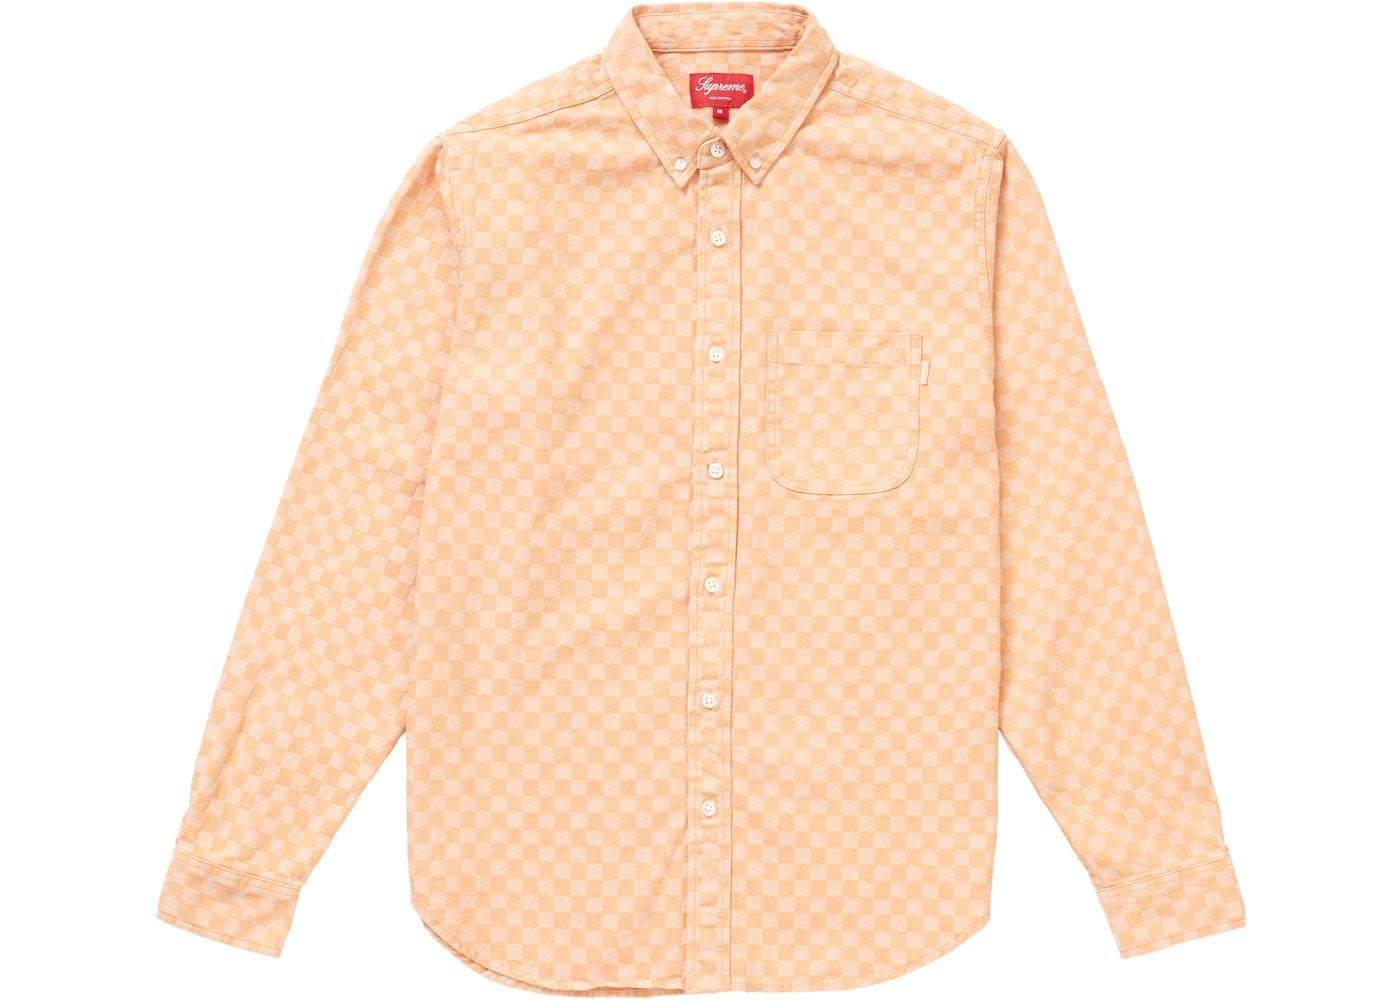 1b9dda094e9e Supreme Checkered Denim Shirt Peach - FW18